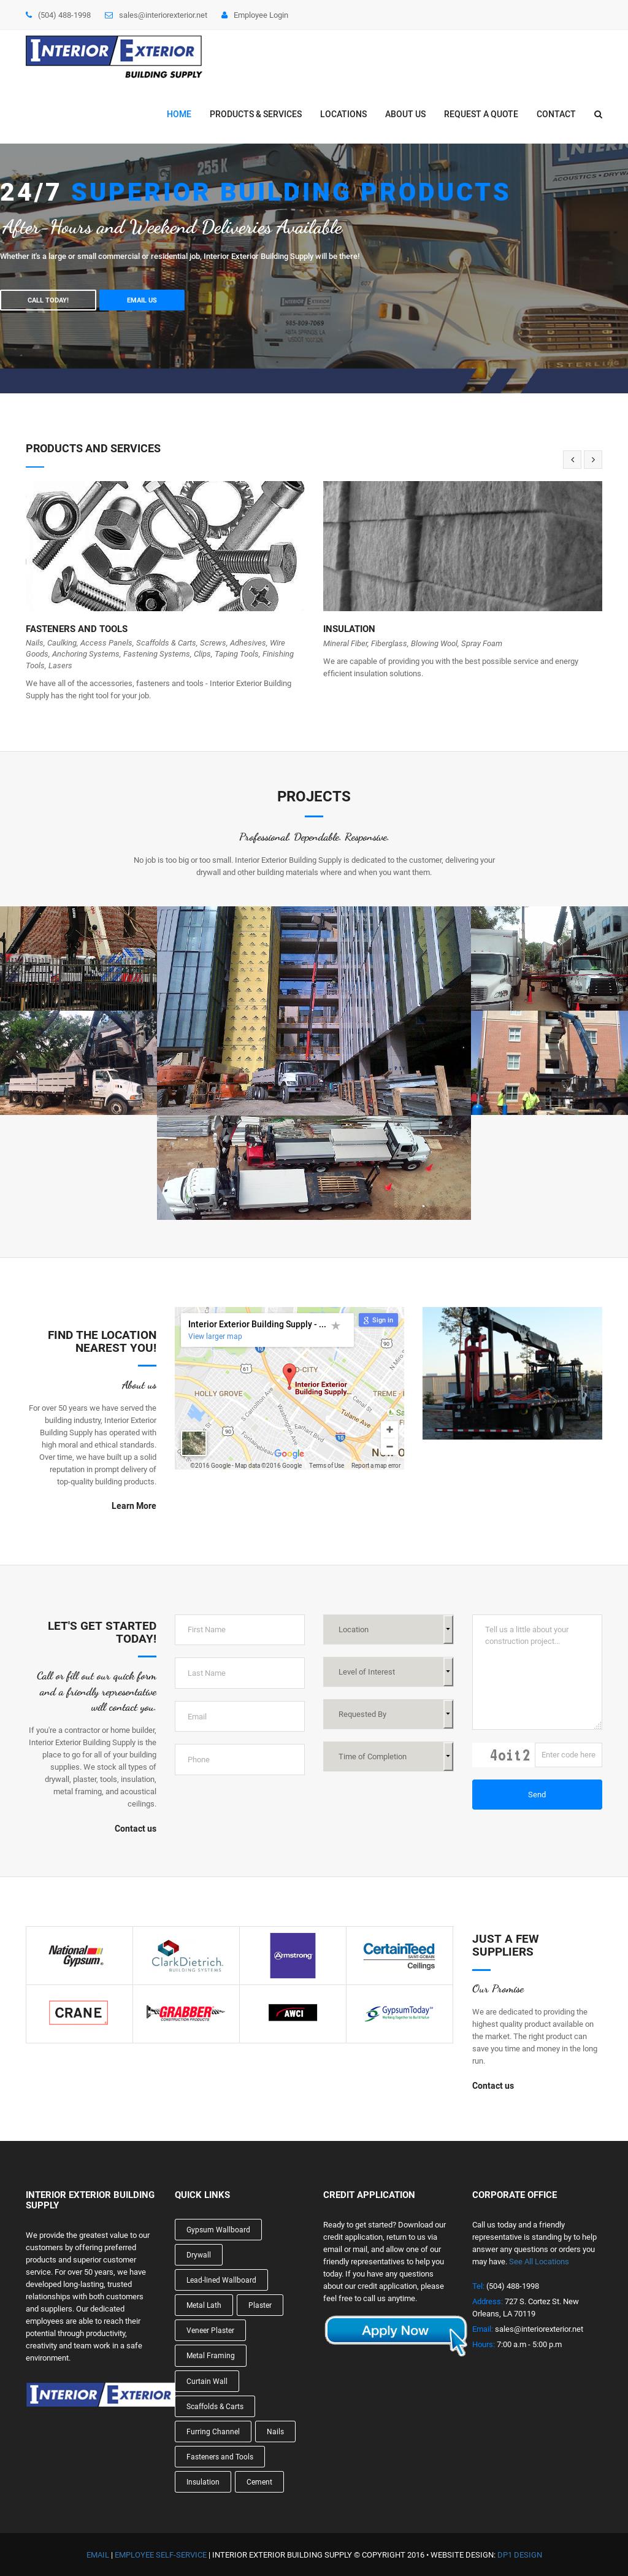 Interior Exterior Building Supply Website History